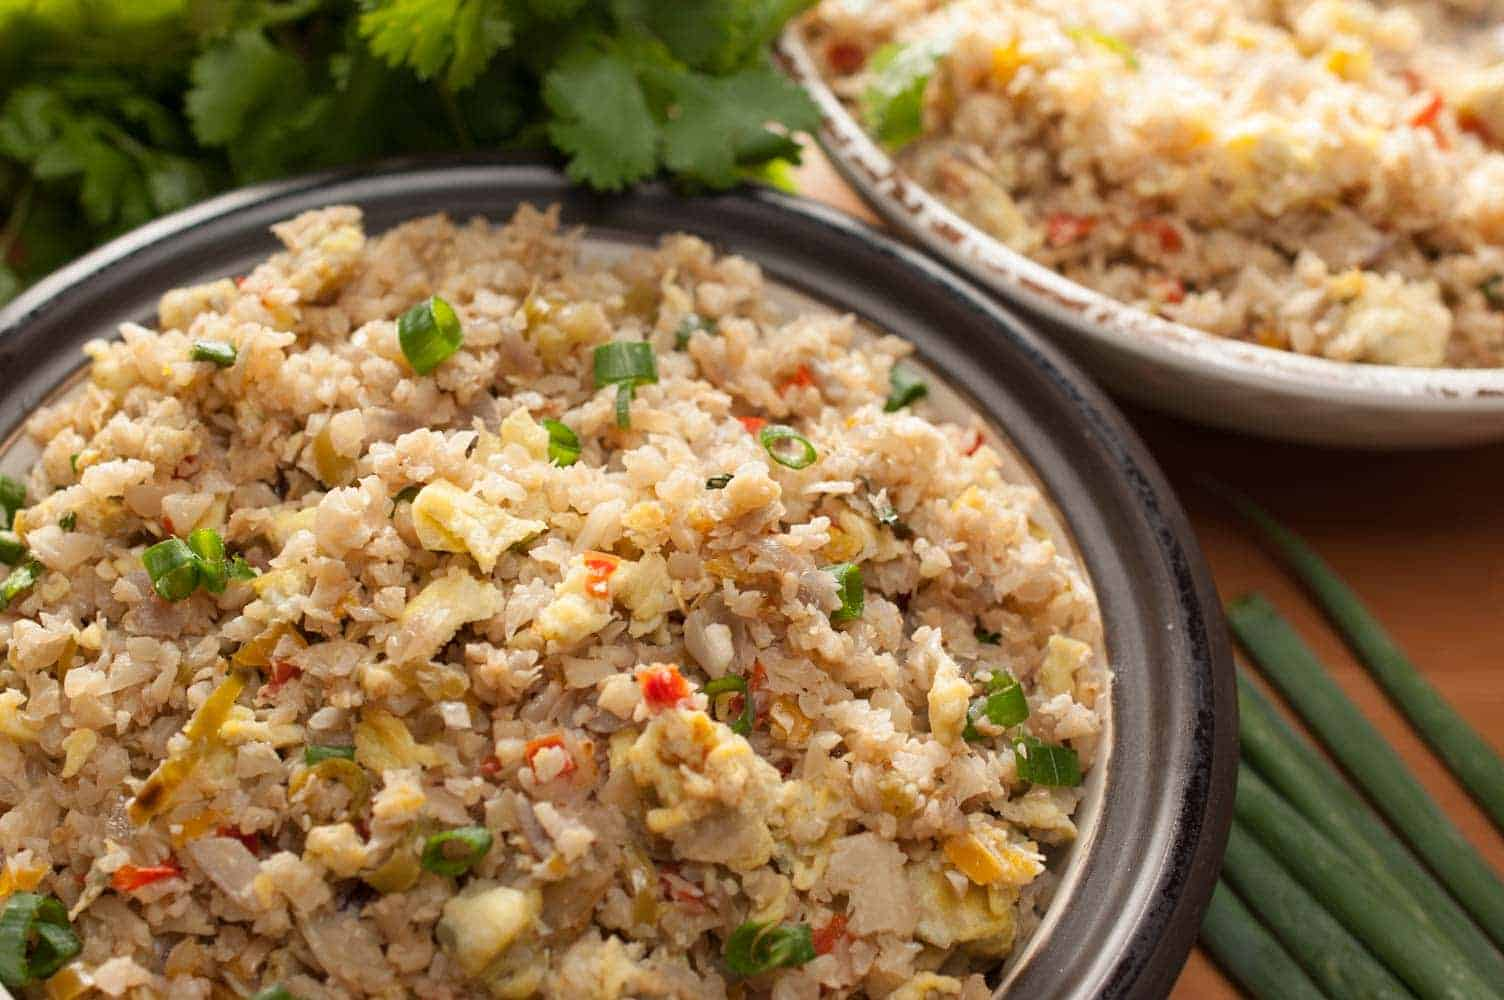 Cauliflower Rice Stir Fry with Eggs (Paleo, Keto, Gluten Free)